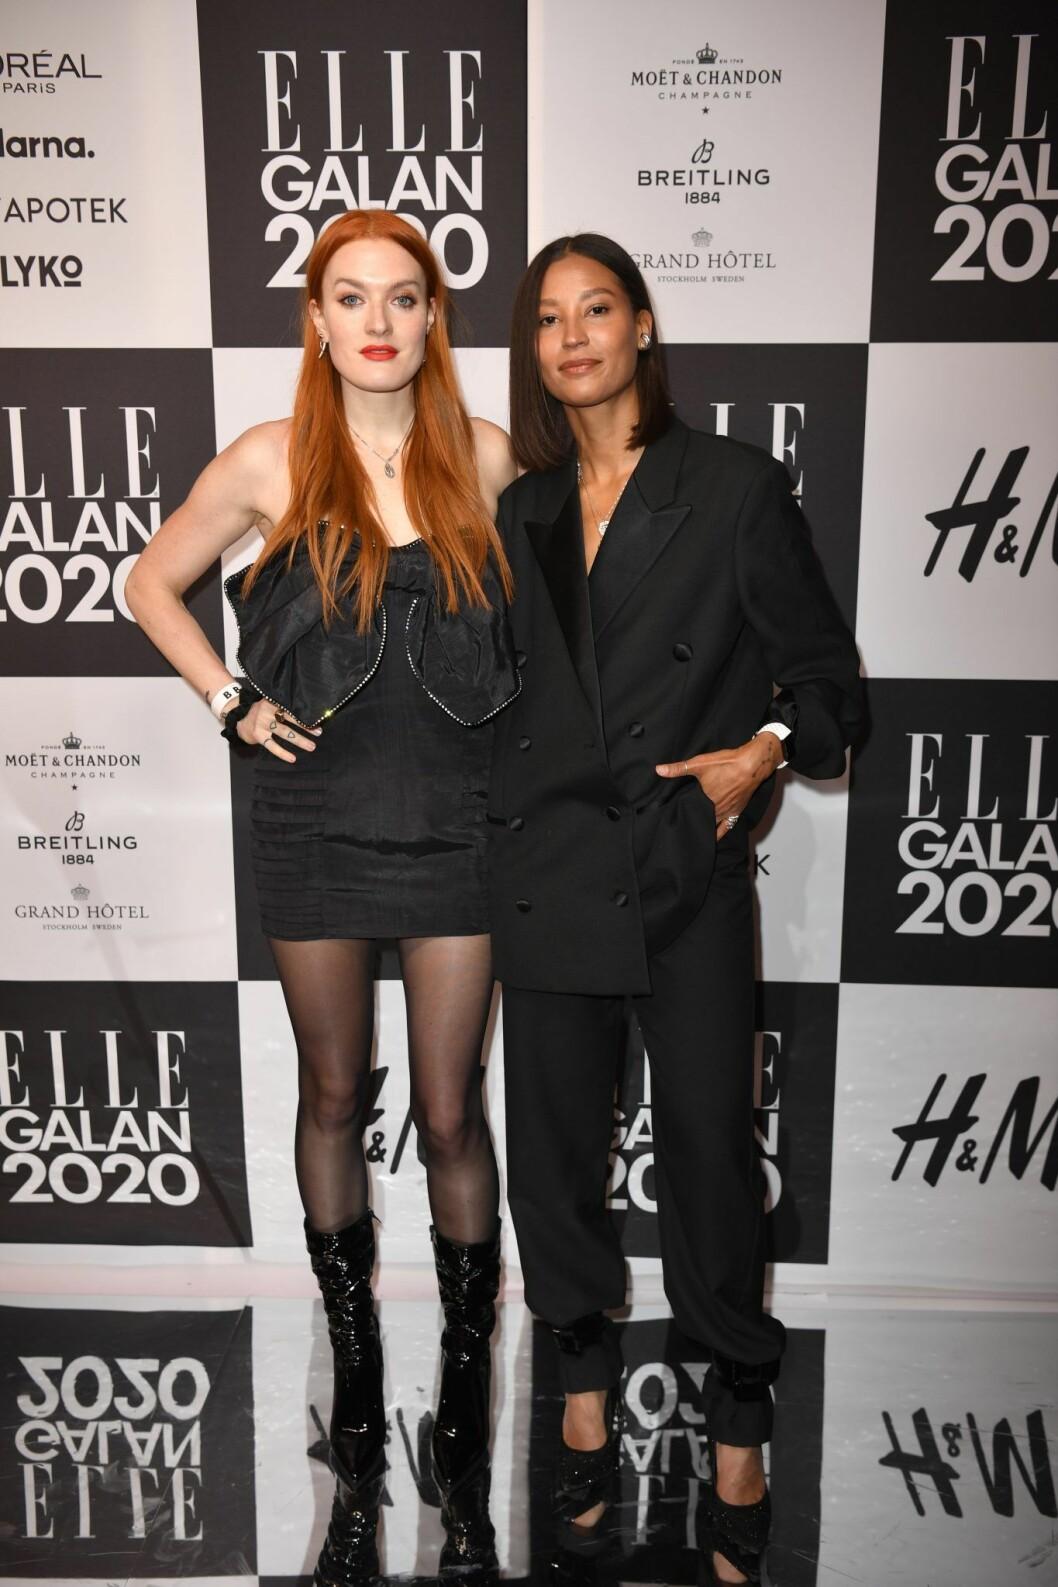 Icona Pop Elle-galan